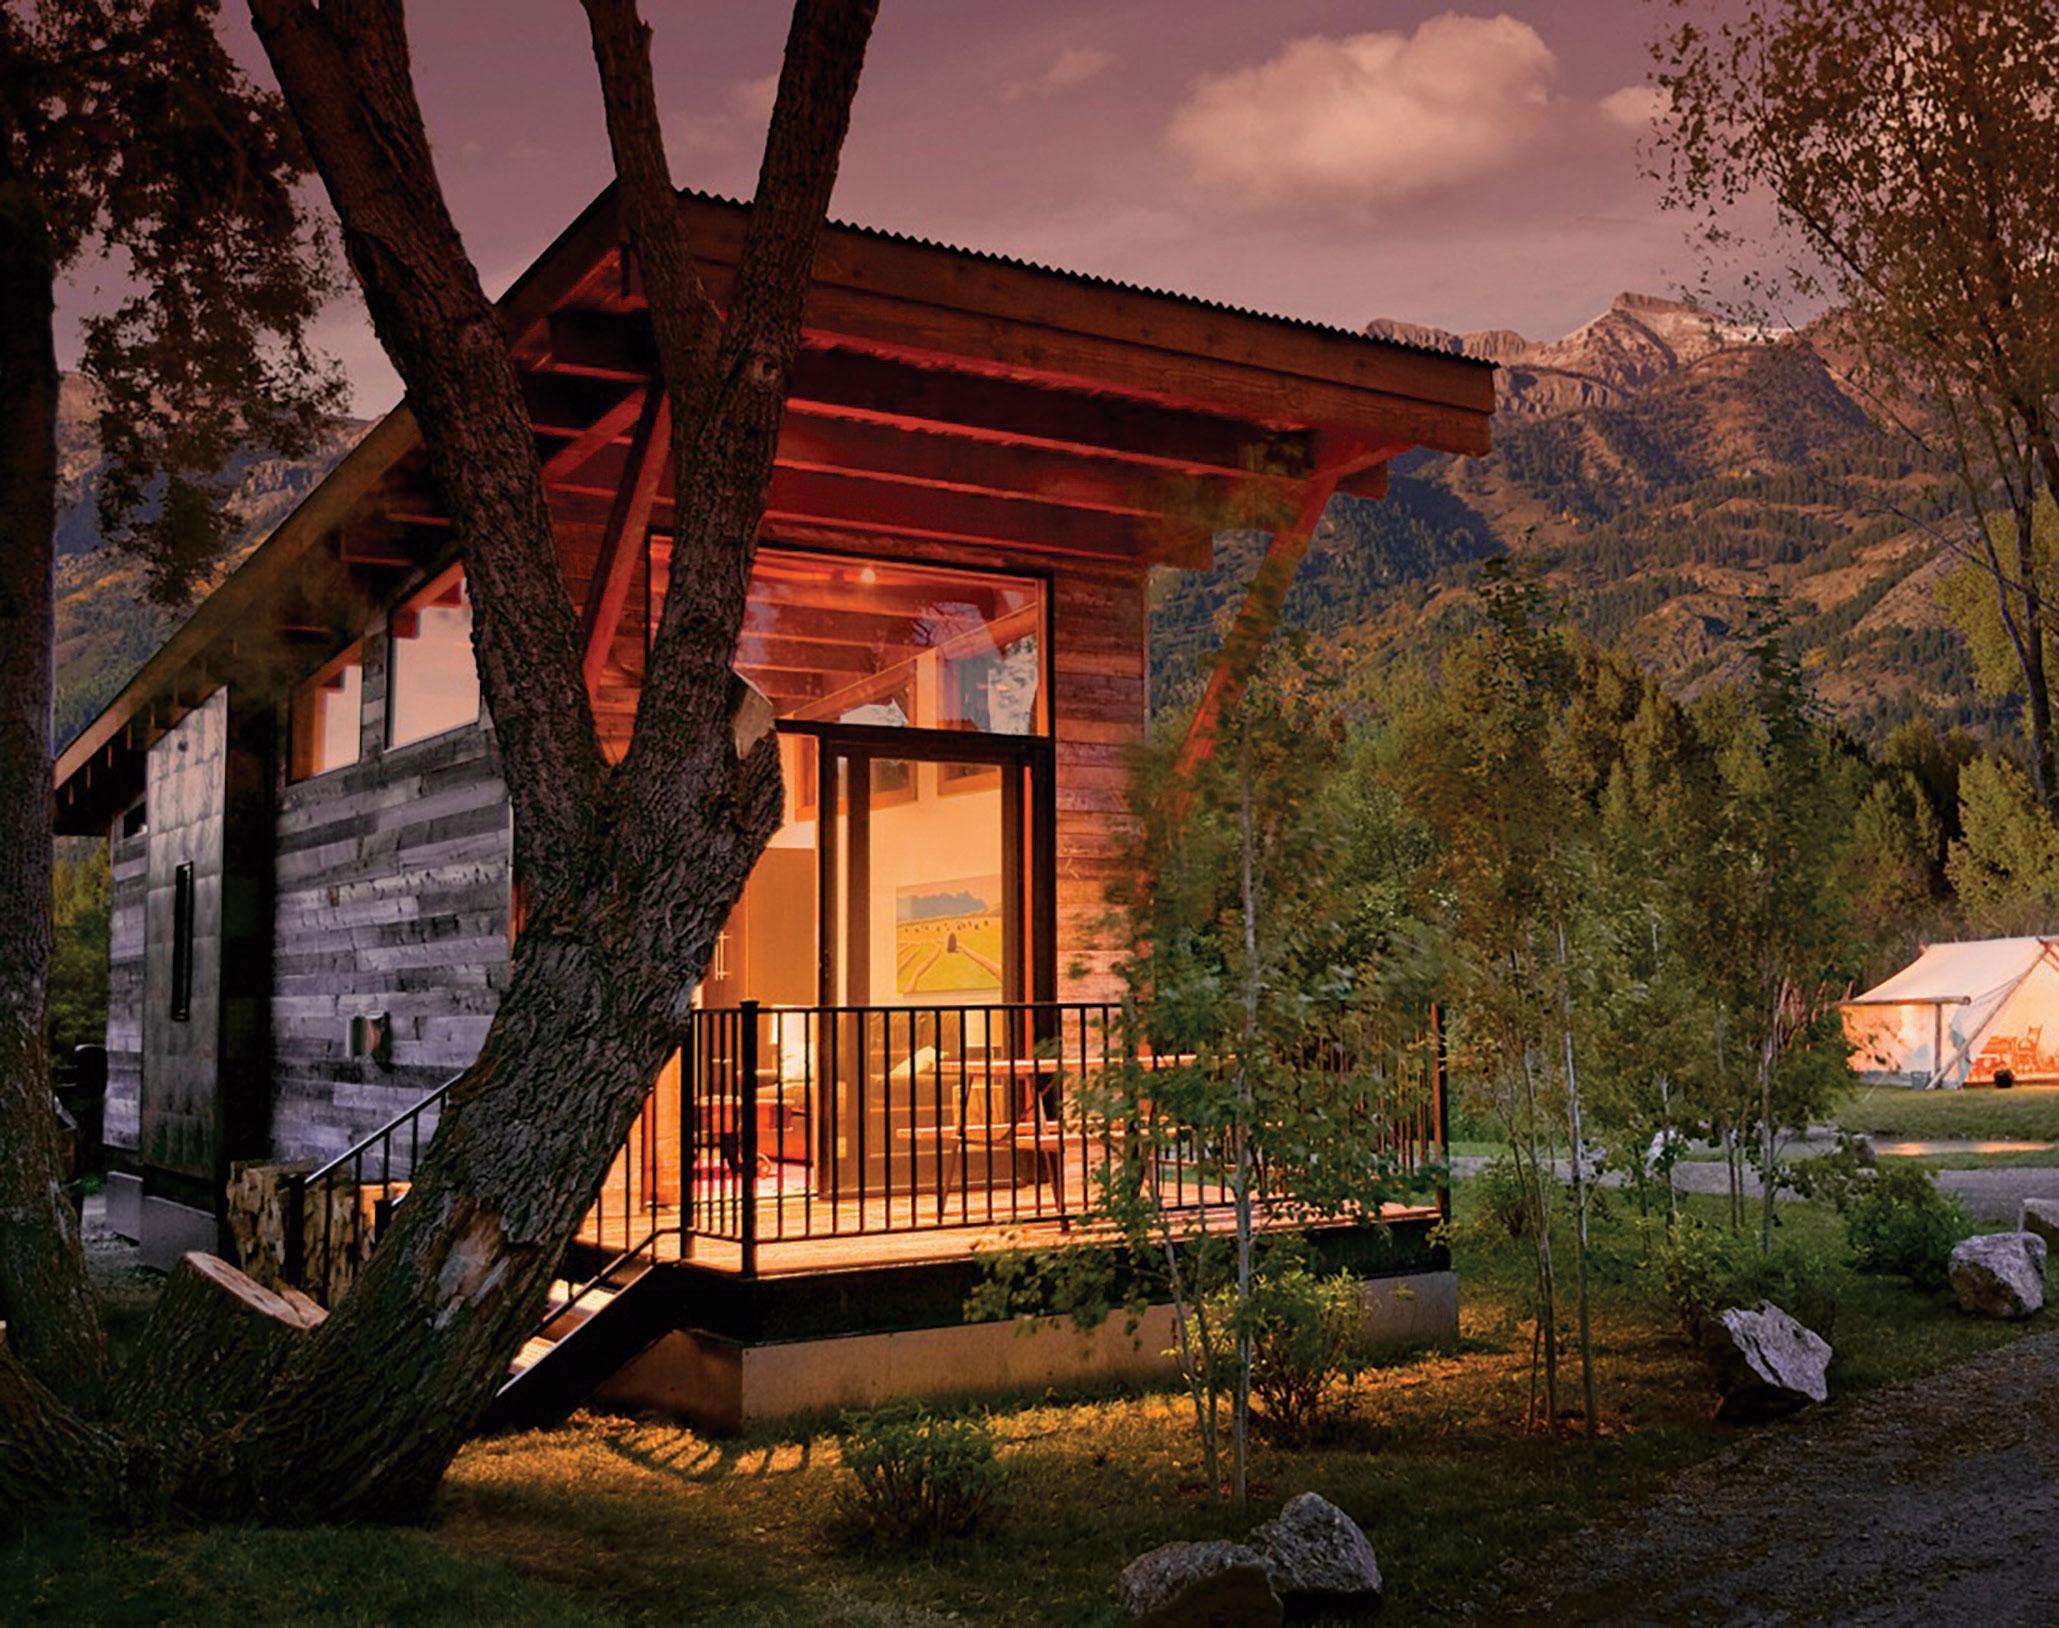 Wheelhaus Cabin